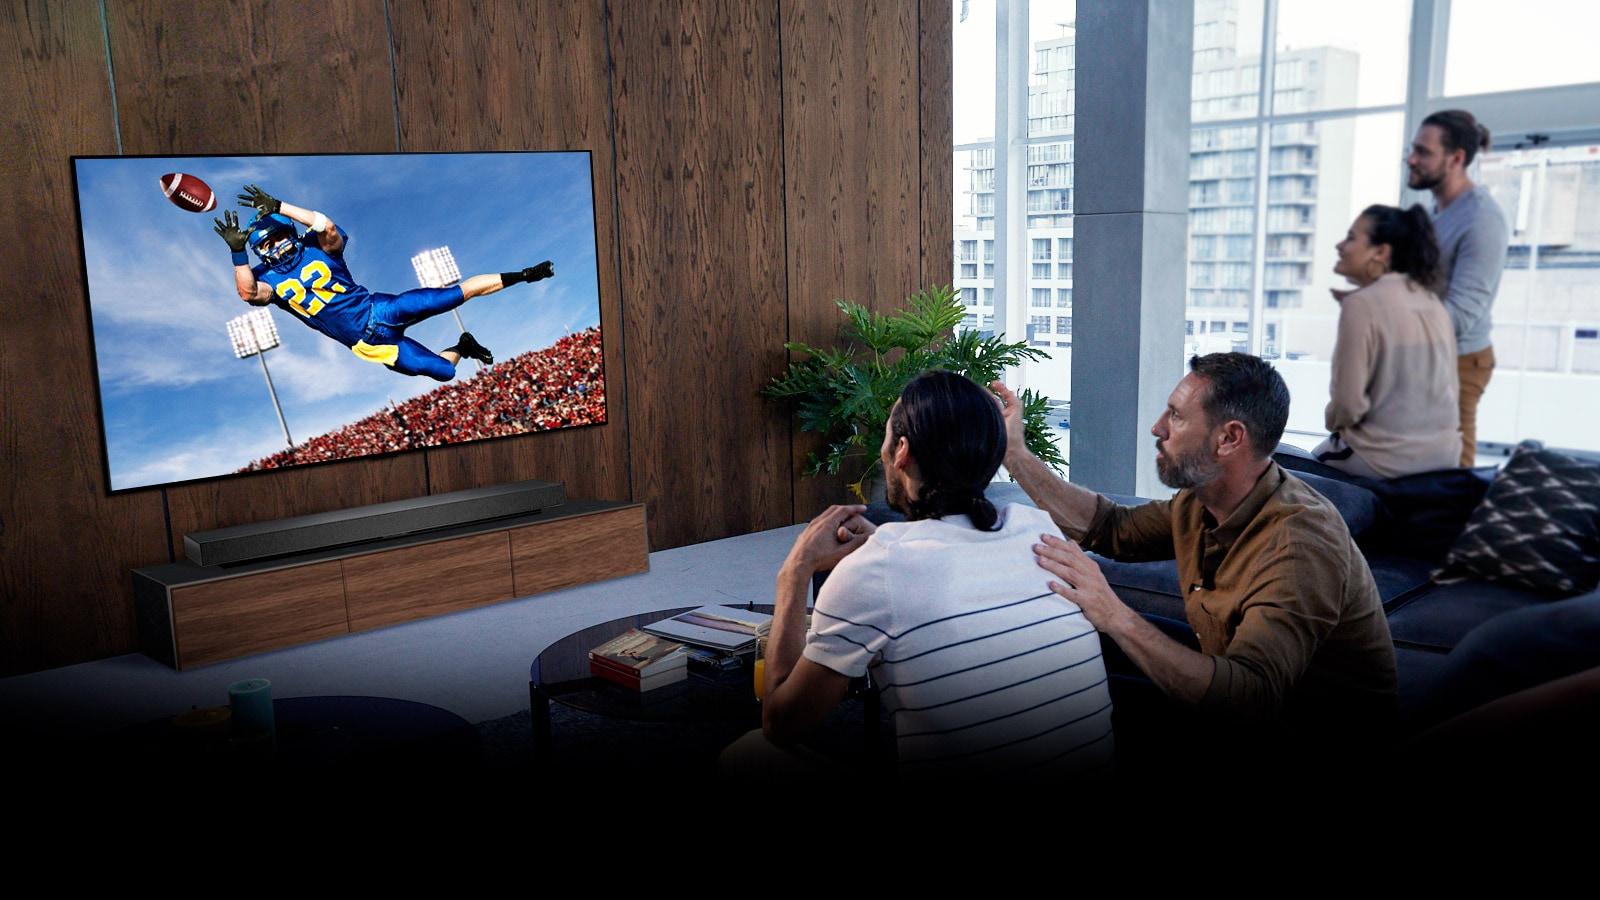 TV-OLED-WX-18-Sports-Desktop.jpg (1600×900)